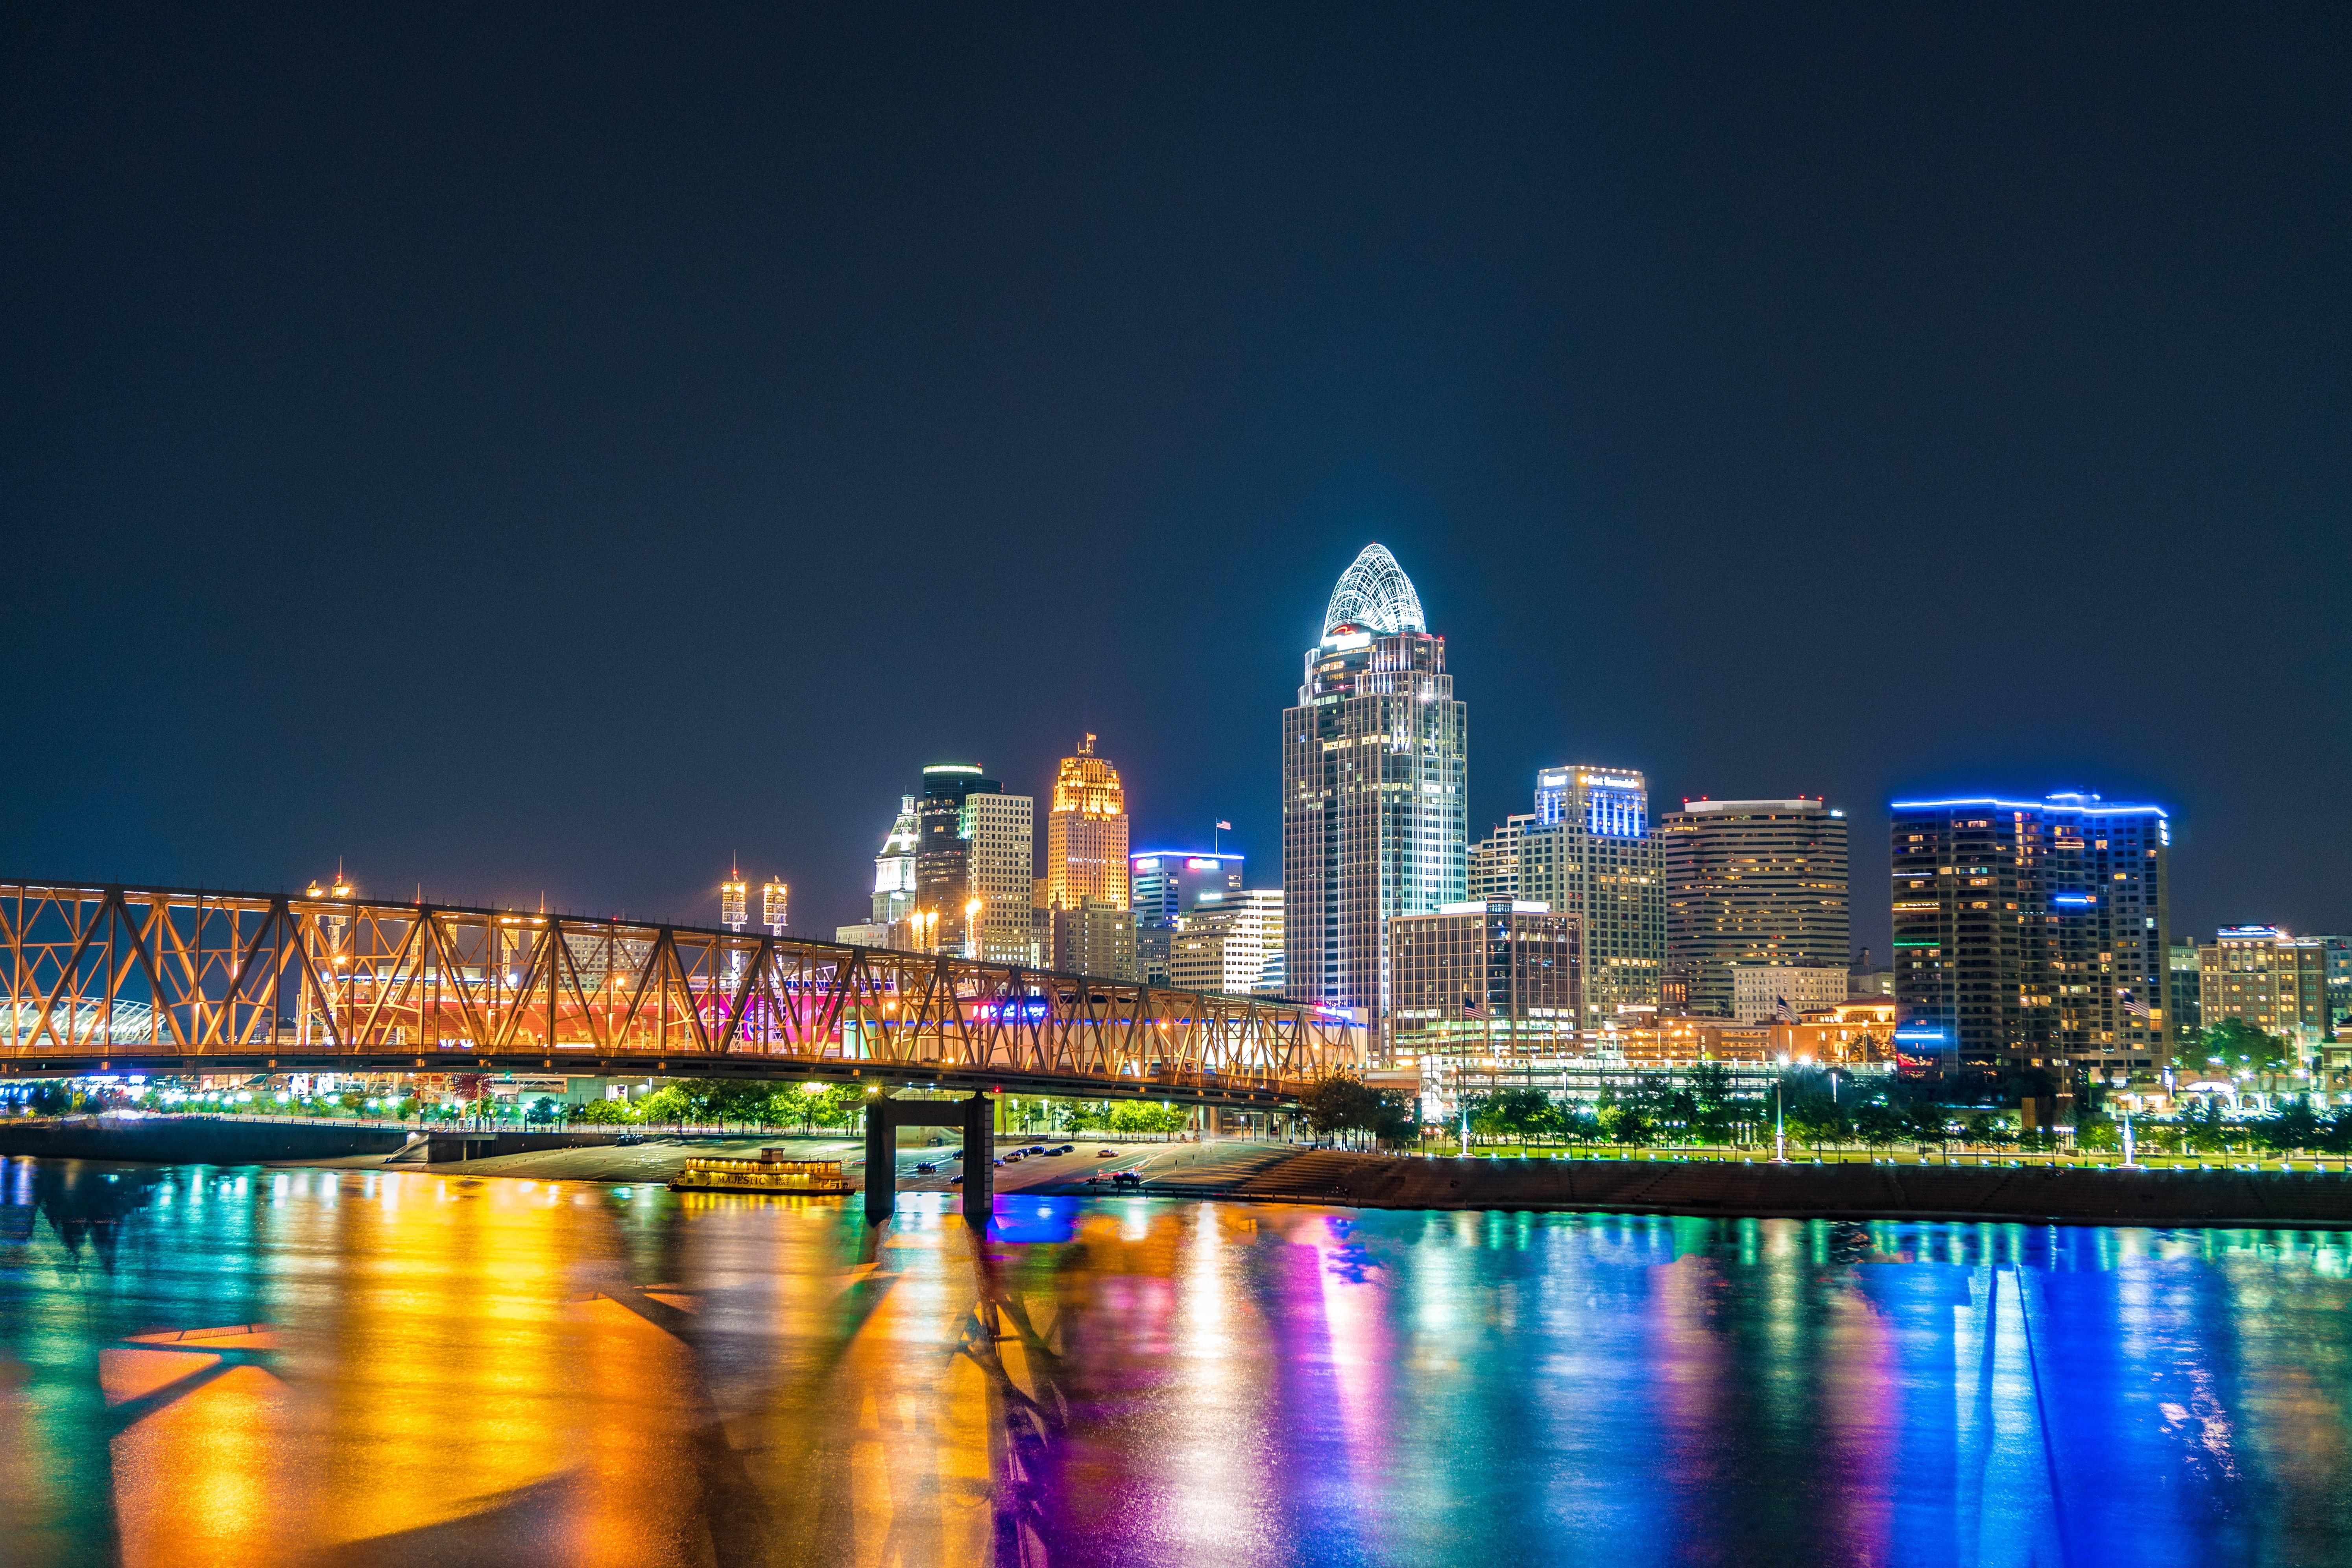 startups in Cincinnati